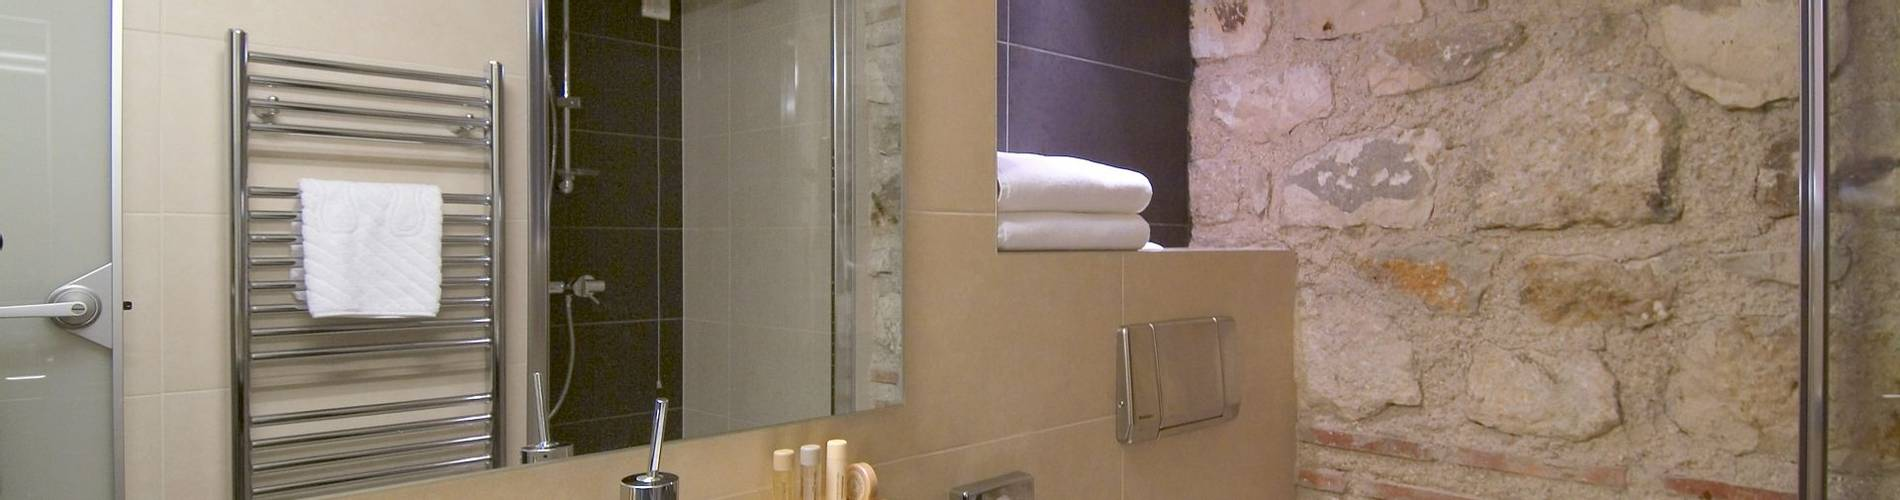 hotel vestibul palace split standard double room bathroom 2.jpg